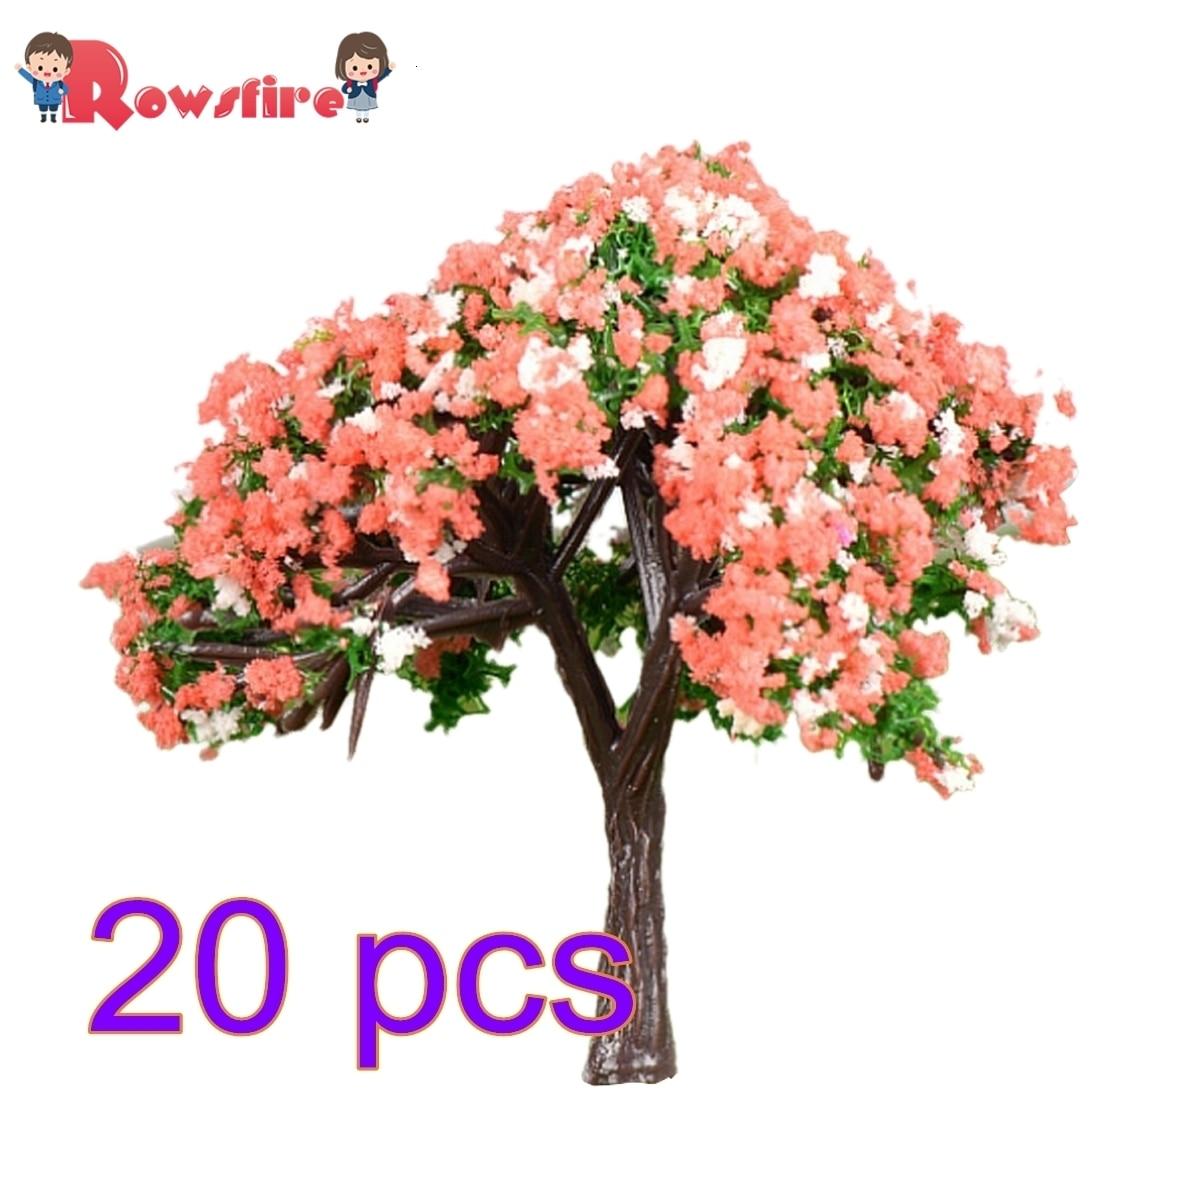 Rowsfire 20pcs 5.8cm Ho 1:85 Scale Hibiscus Tree Model Railroad Architecture Diorama Tree For Diy Scenery Landscape